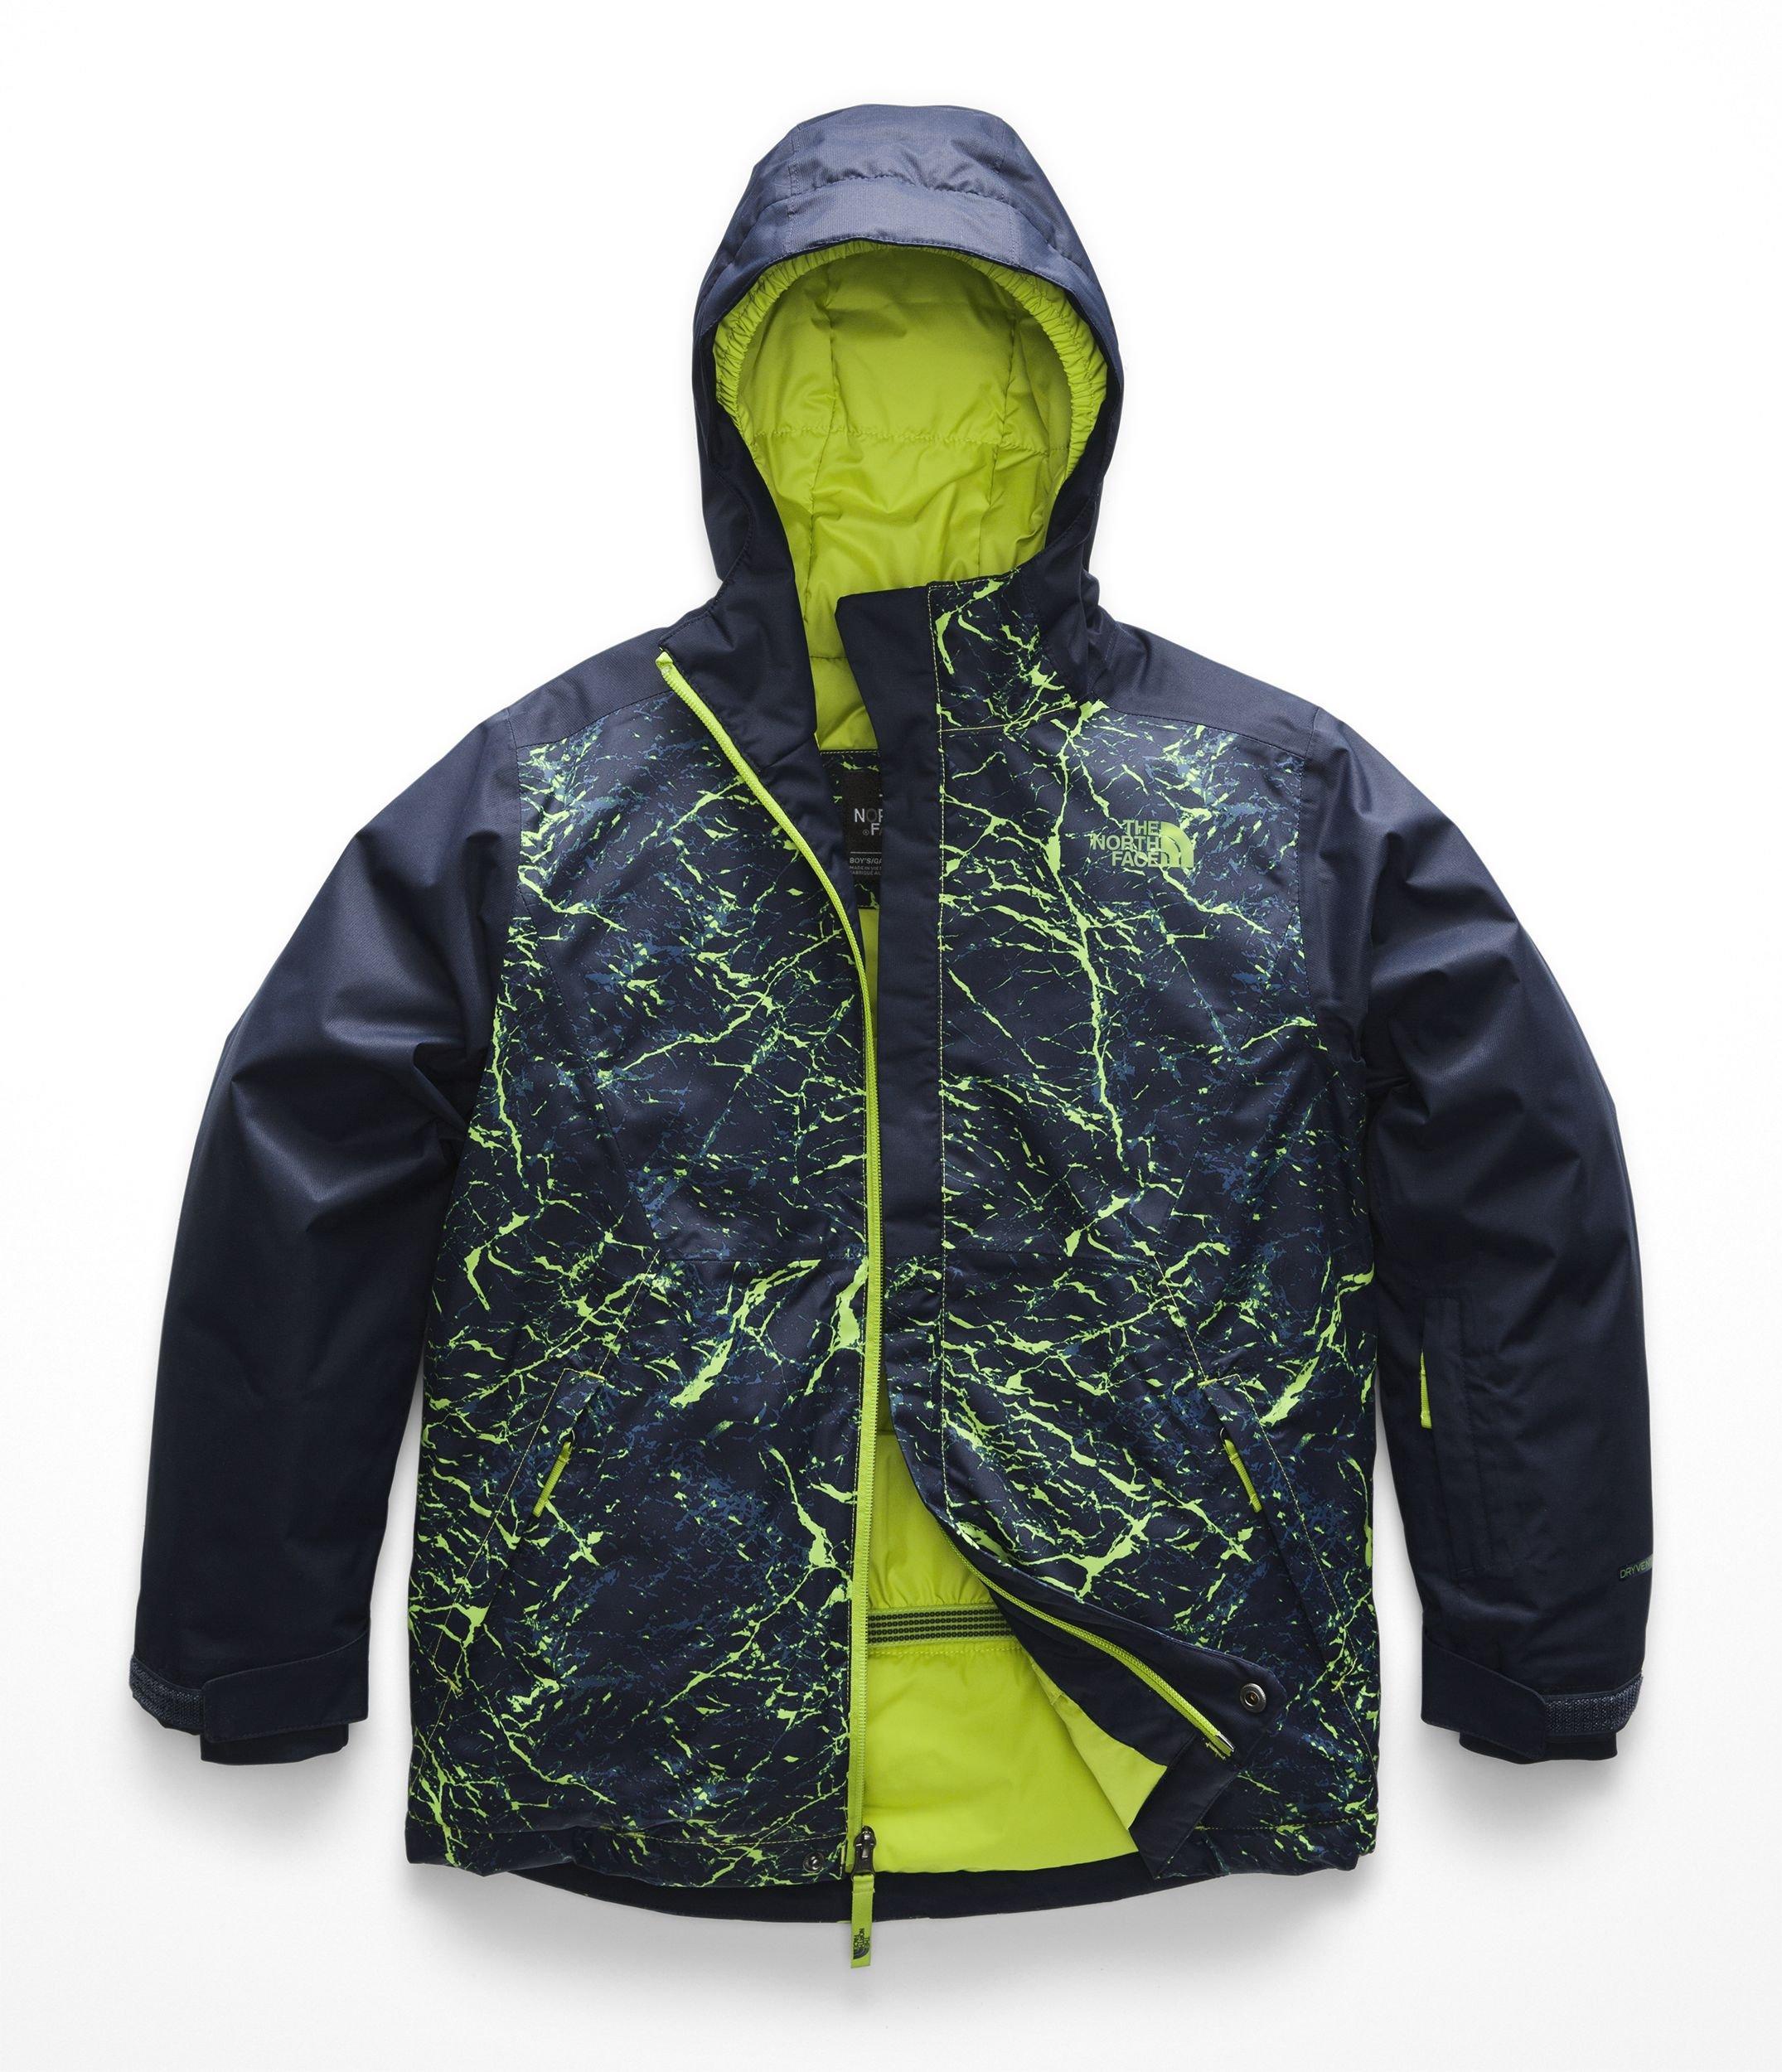 The North Face Kids Boy's Brayden Insulated Jacket (Little Kids/Big Kids) Lime Green Granite Print X-Large